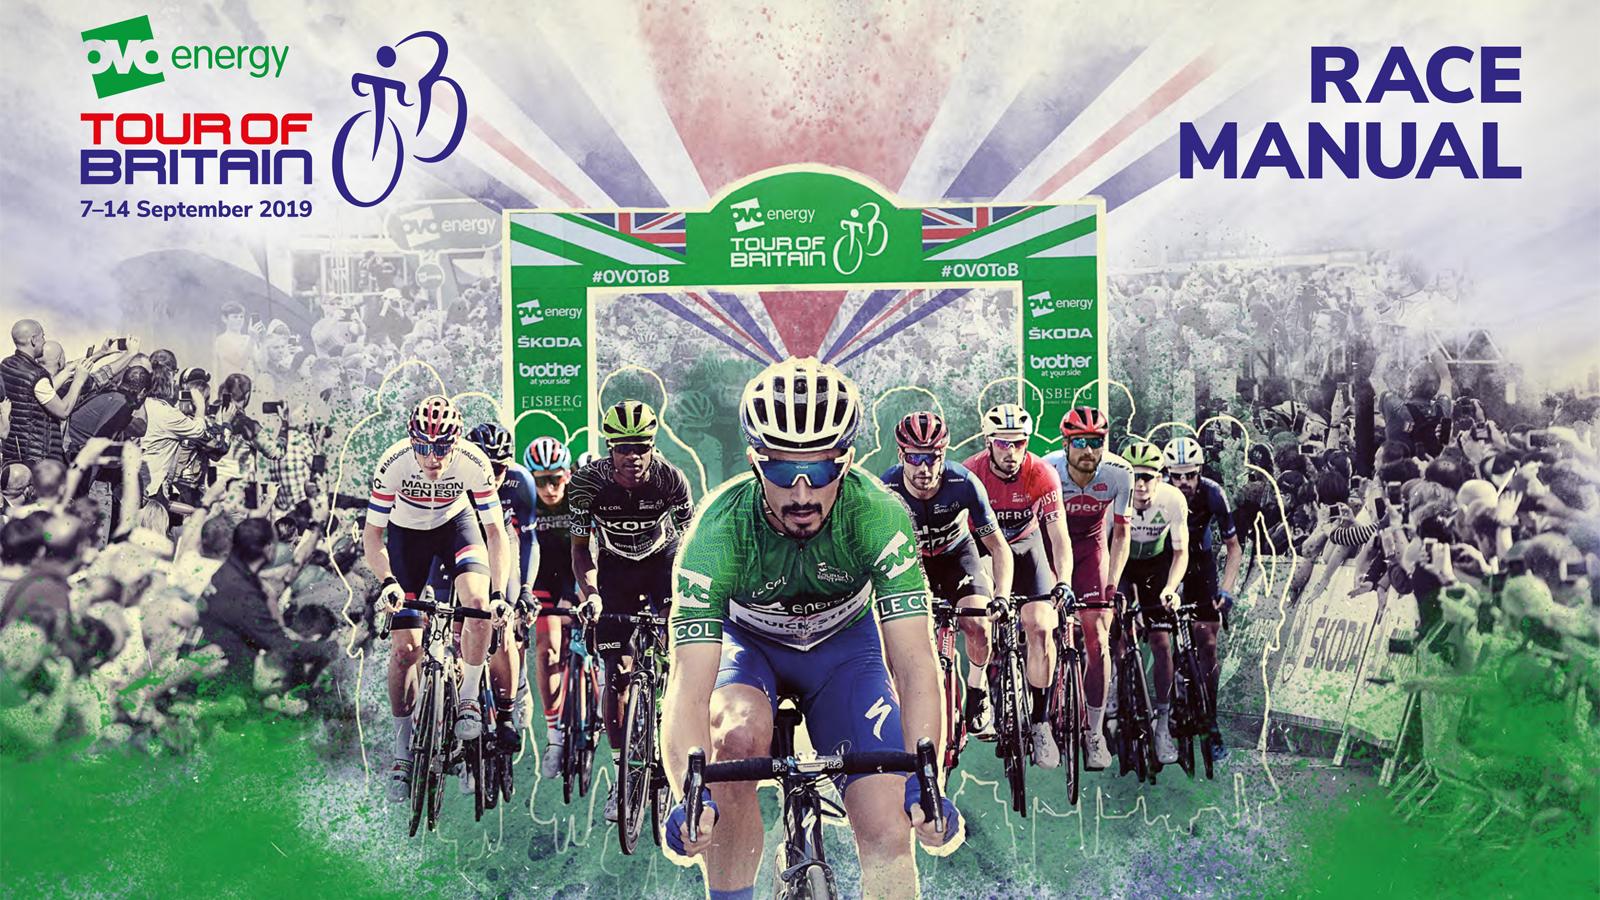 Tour of Britain race manual